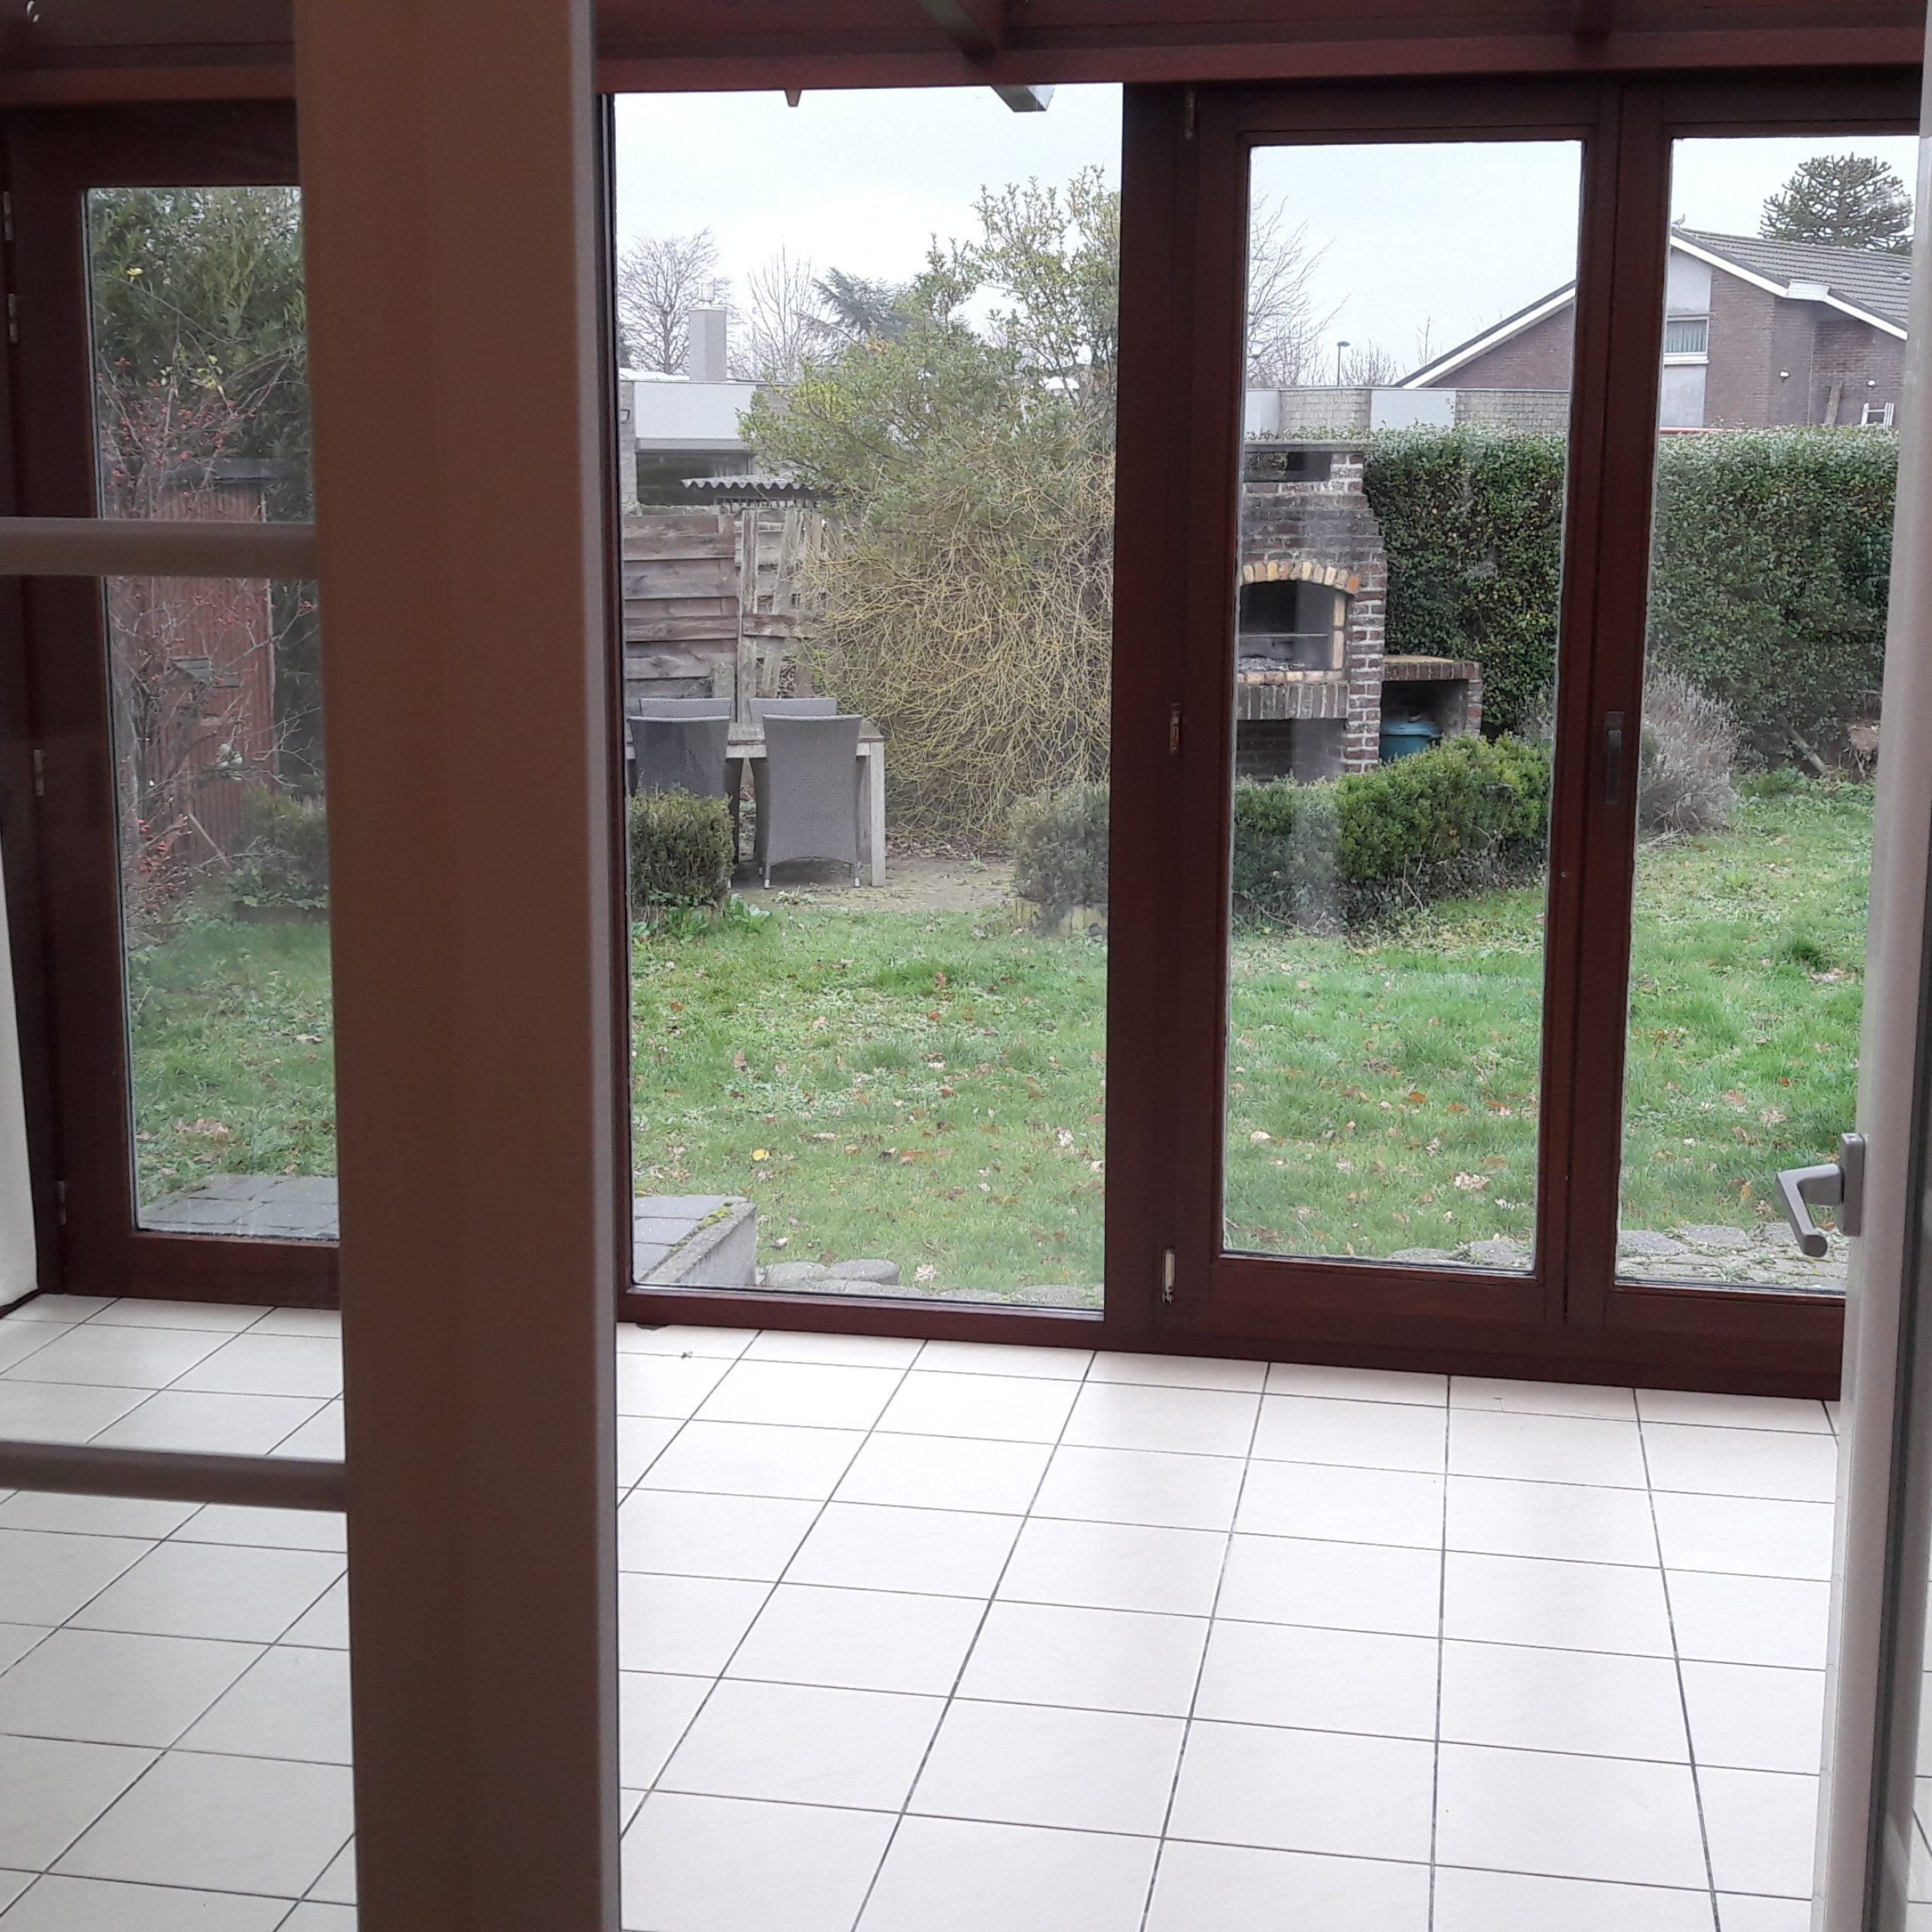 Evergem - Expat house near Ghent